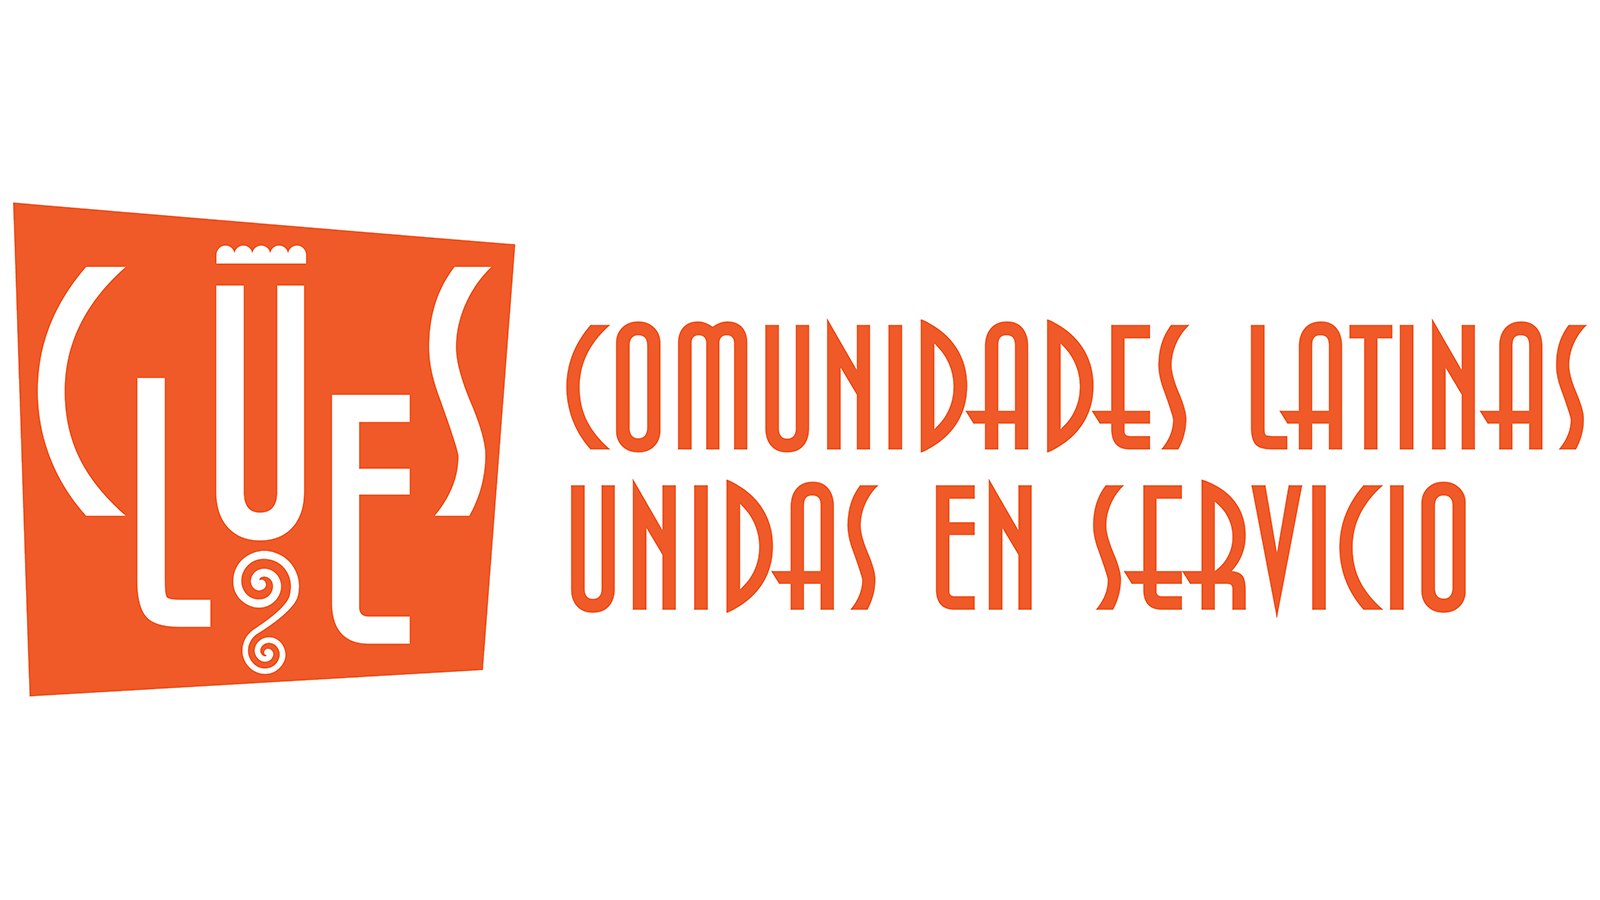 Clues logo